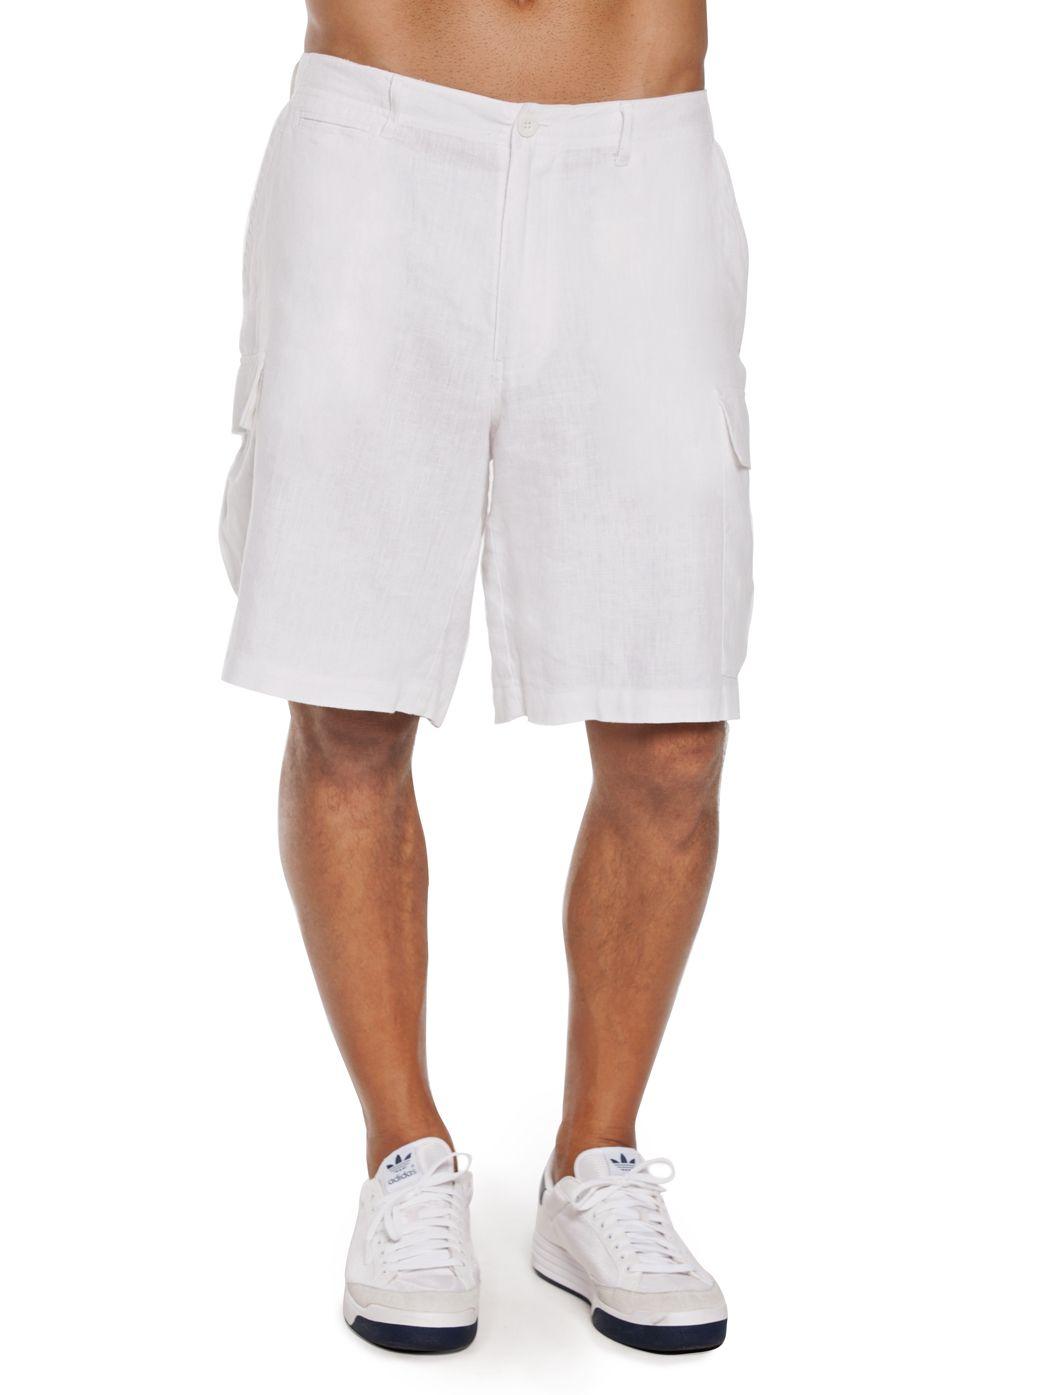 White Linen Explorer Cargo Shorts for Men | Island Company | Club ...